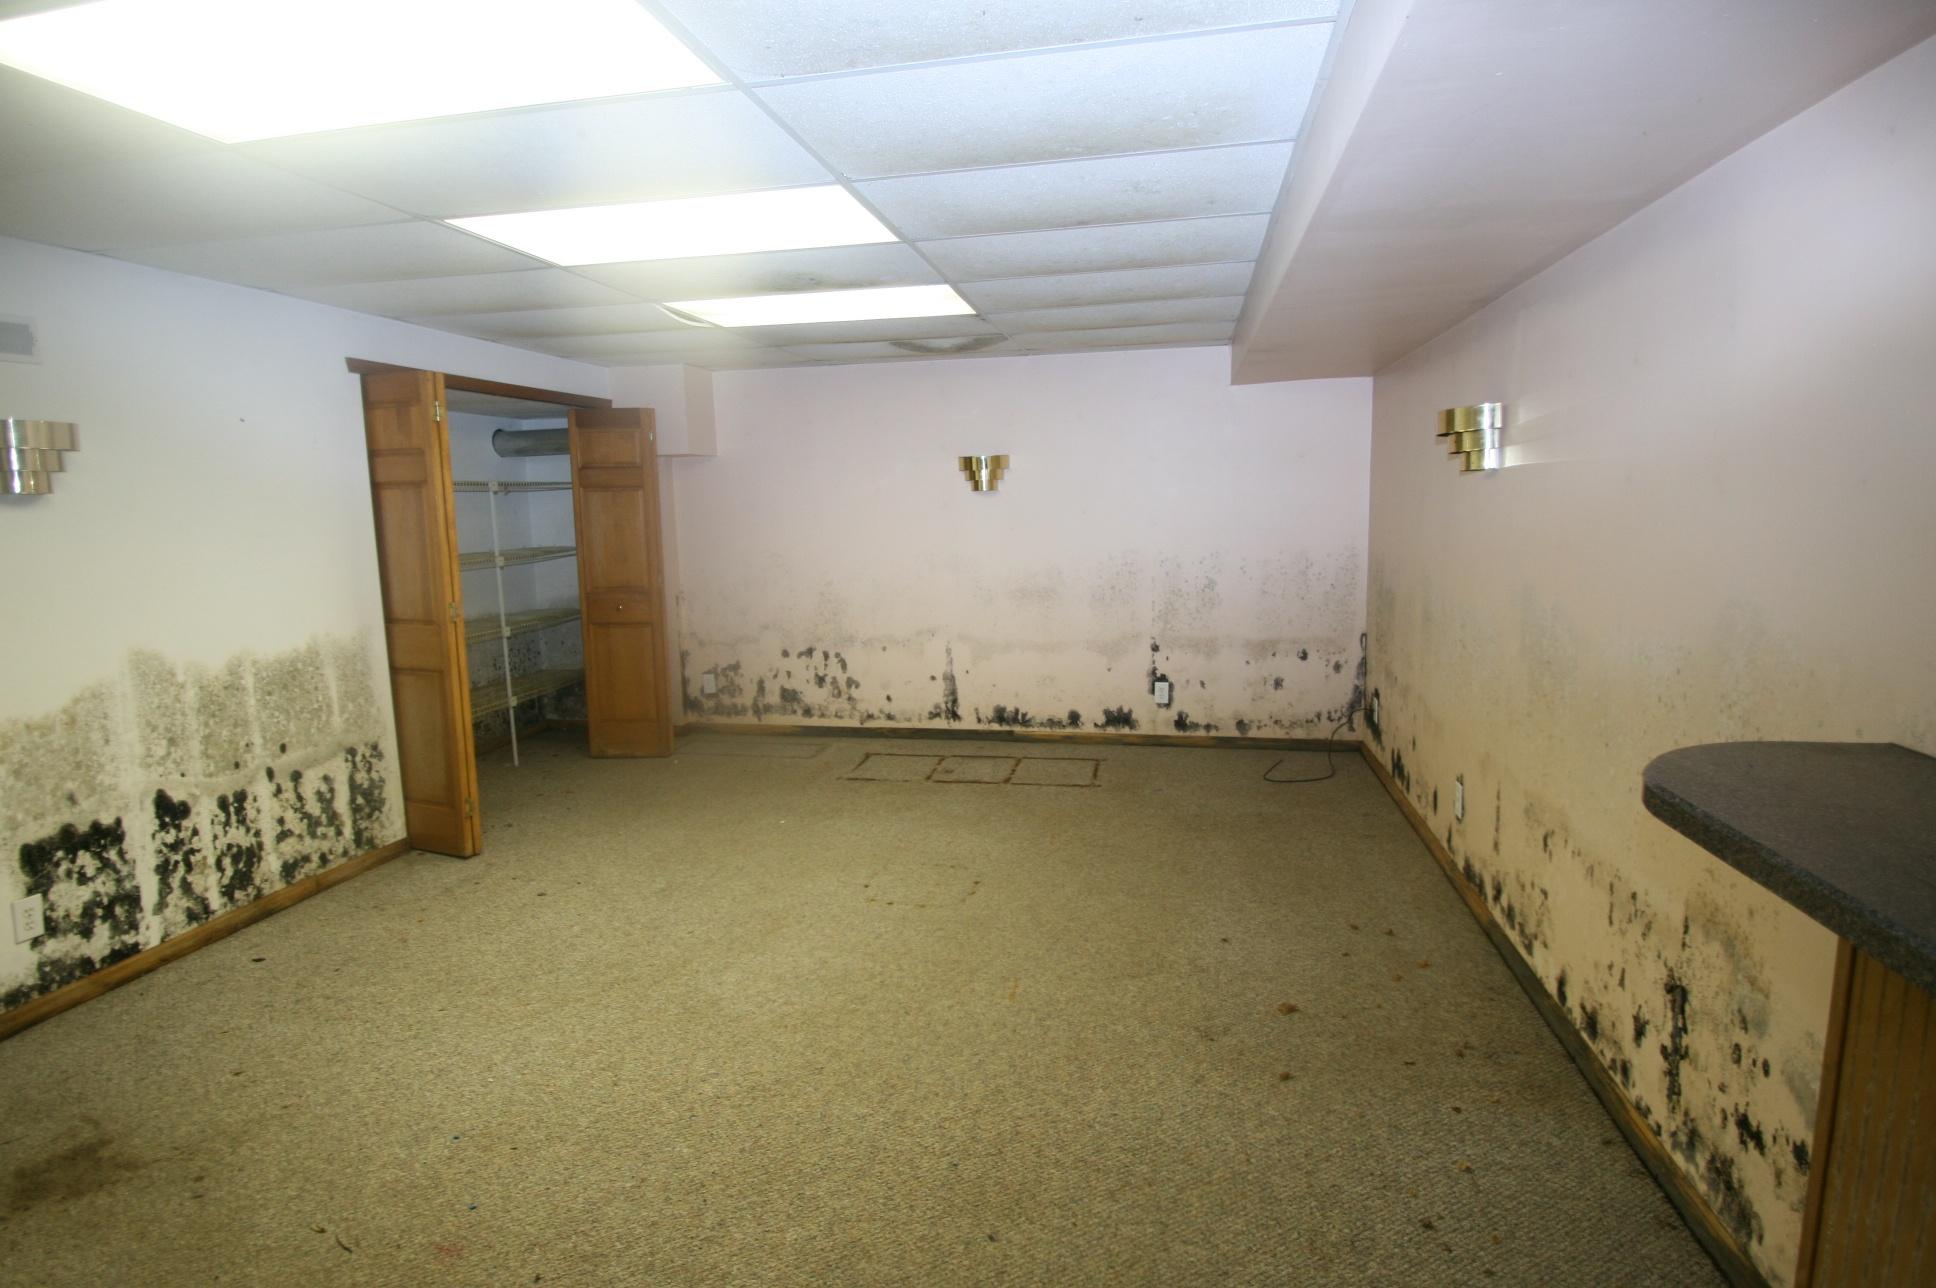 Mold in basement.jpg